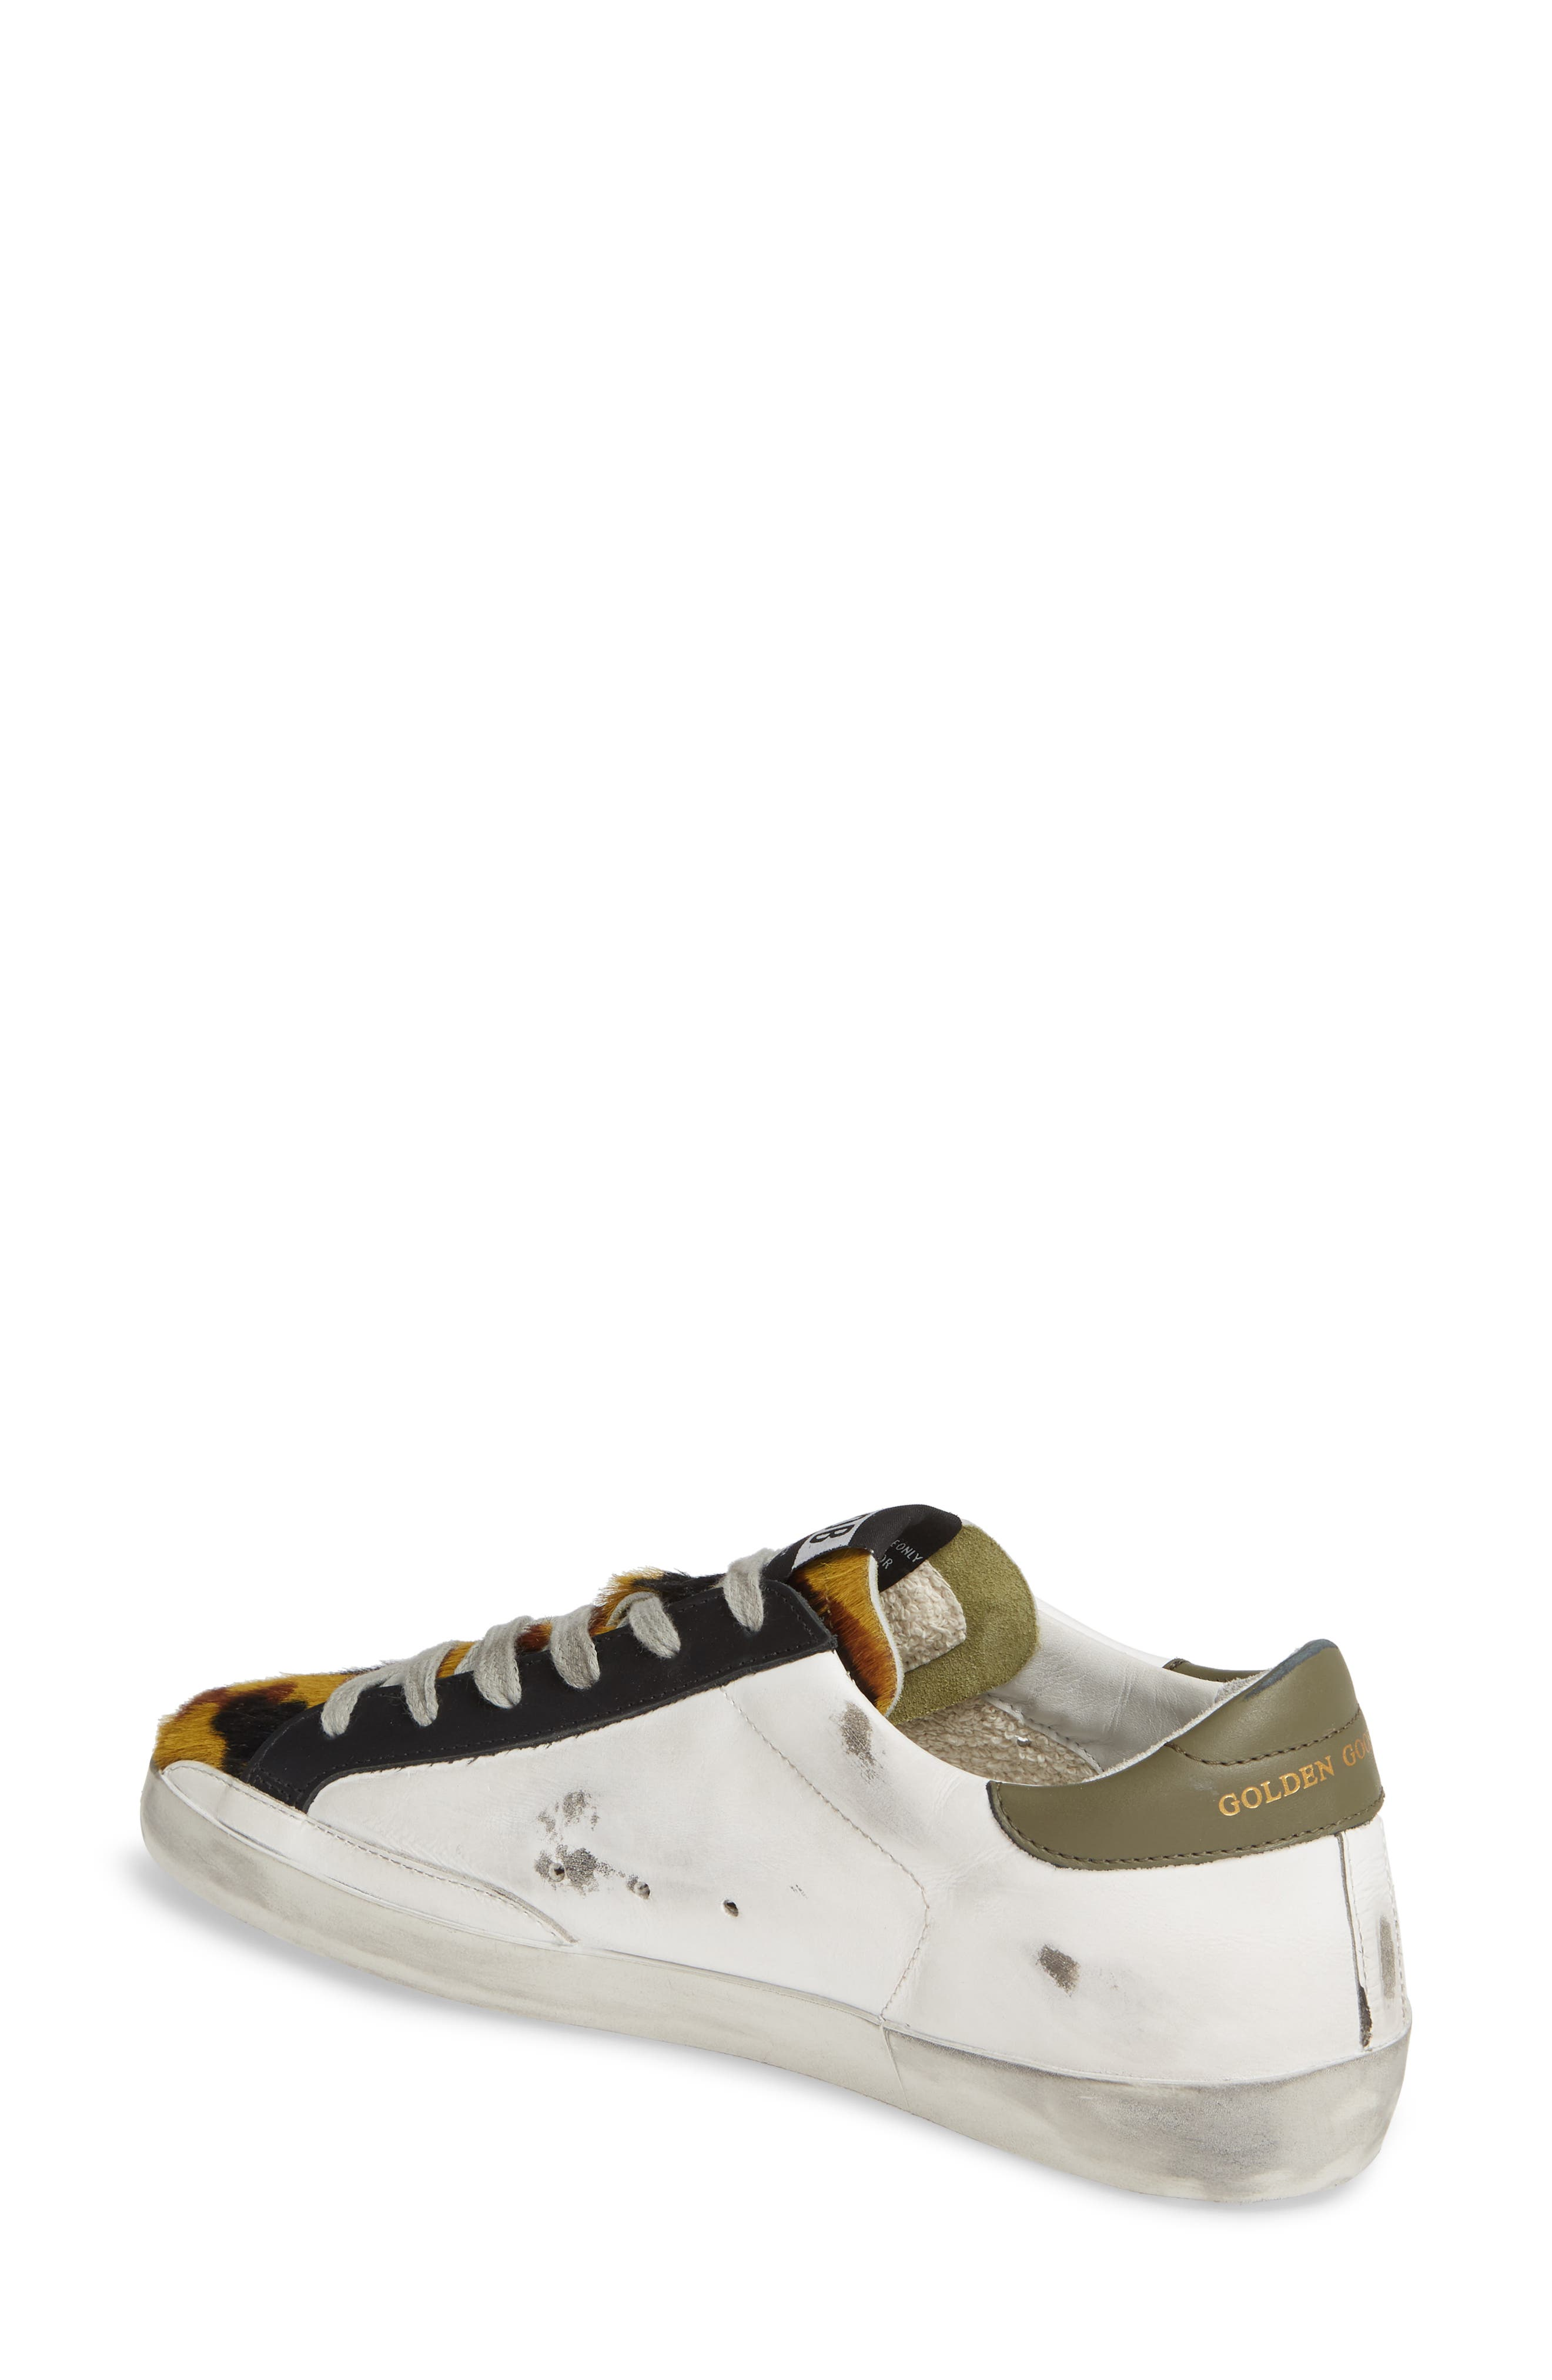 GOLDEN GOOSE,                             Superstar Genuine Calf Hair Sneaker,                             Alternate thumbnail 2, color,                             WHITE/ CAMO